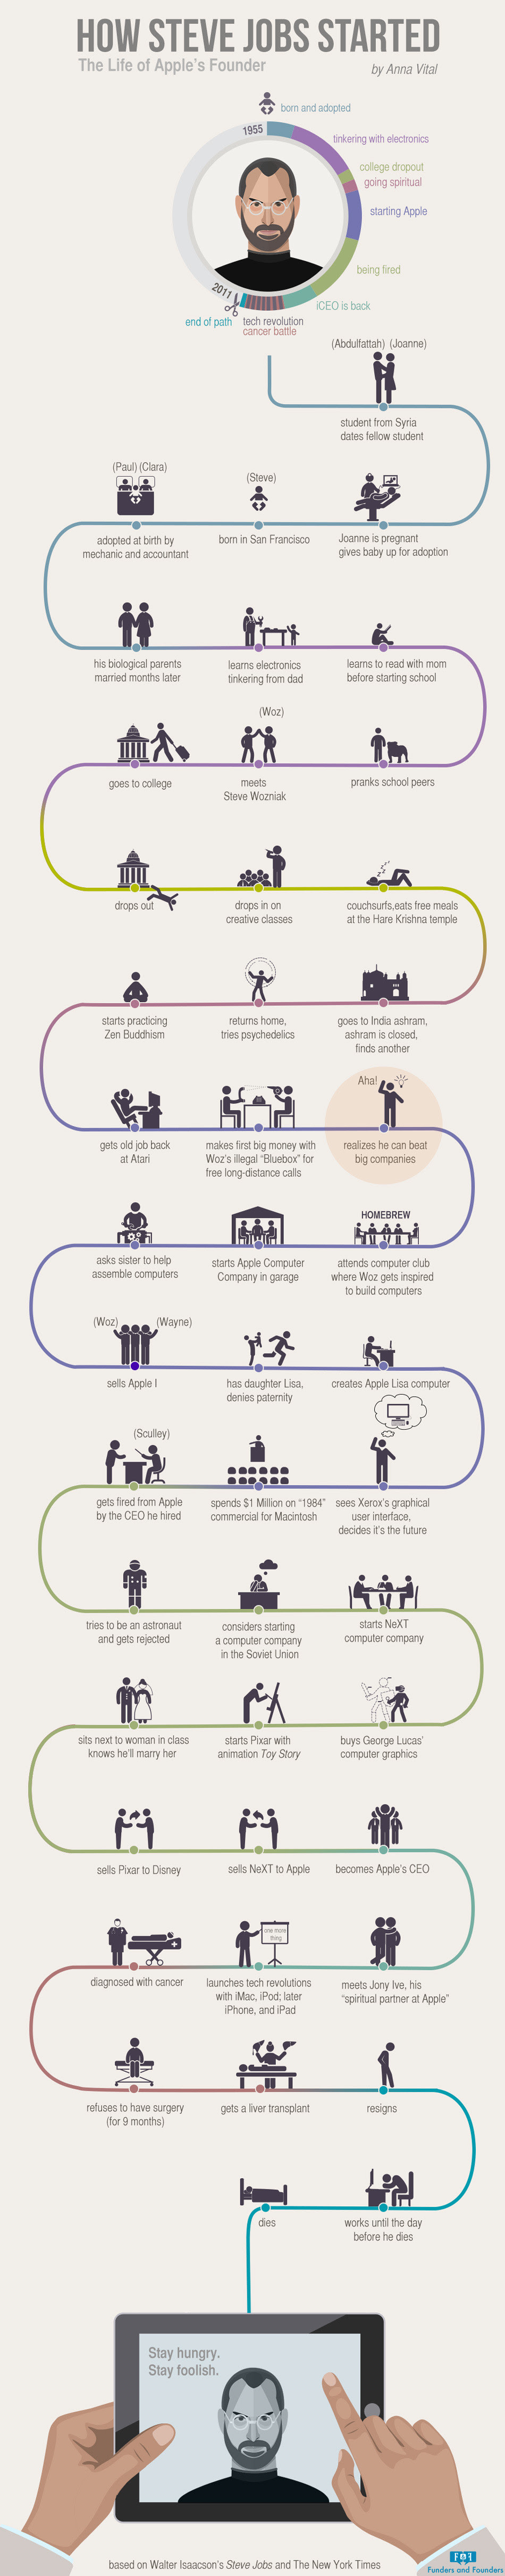 Infographic: How Steve Jobs Started